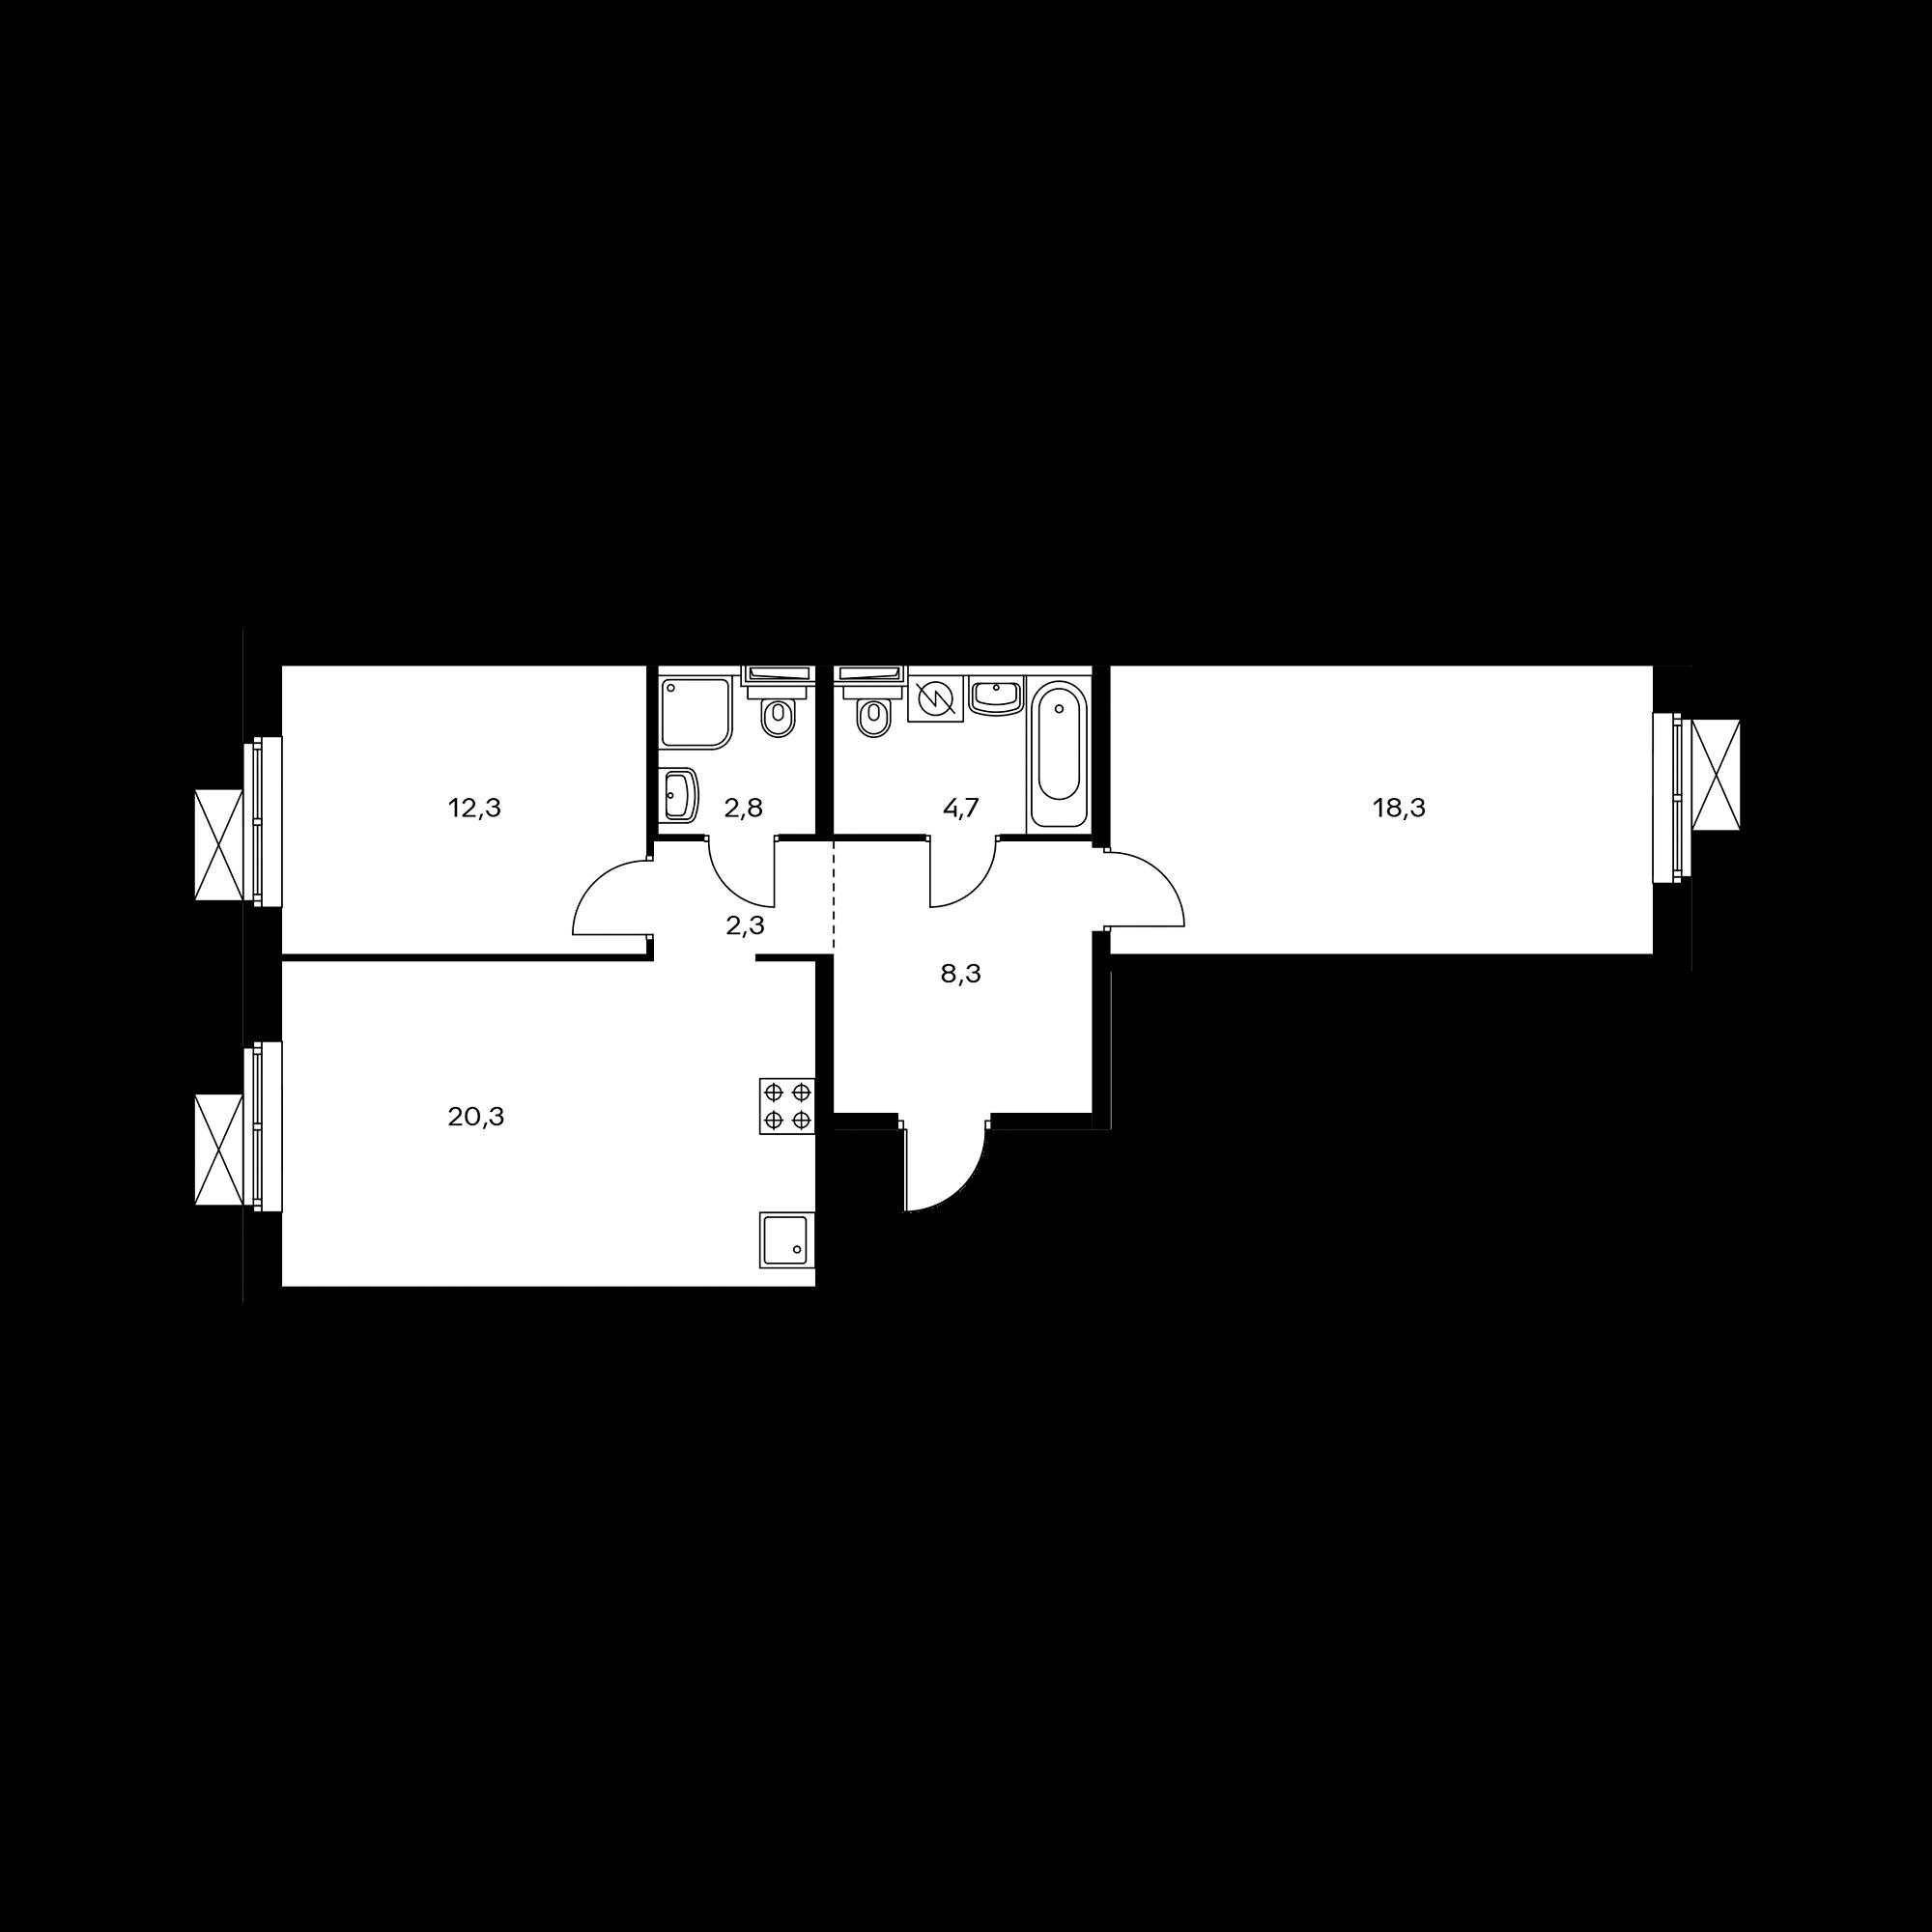 2EL10_6.9-1